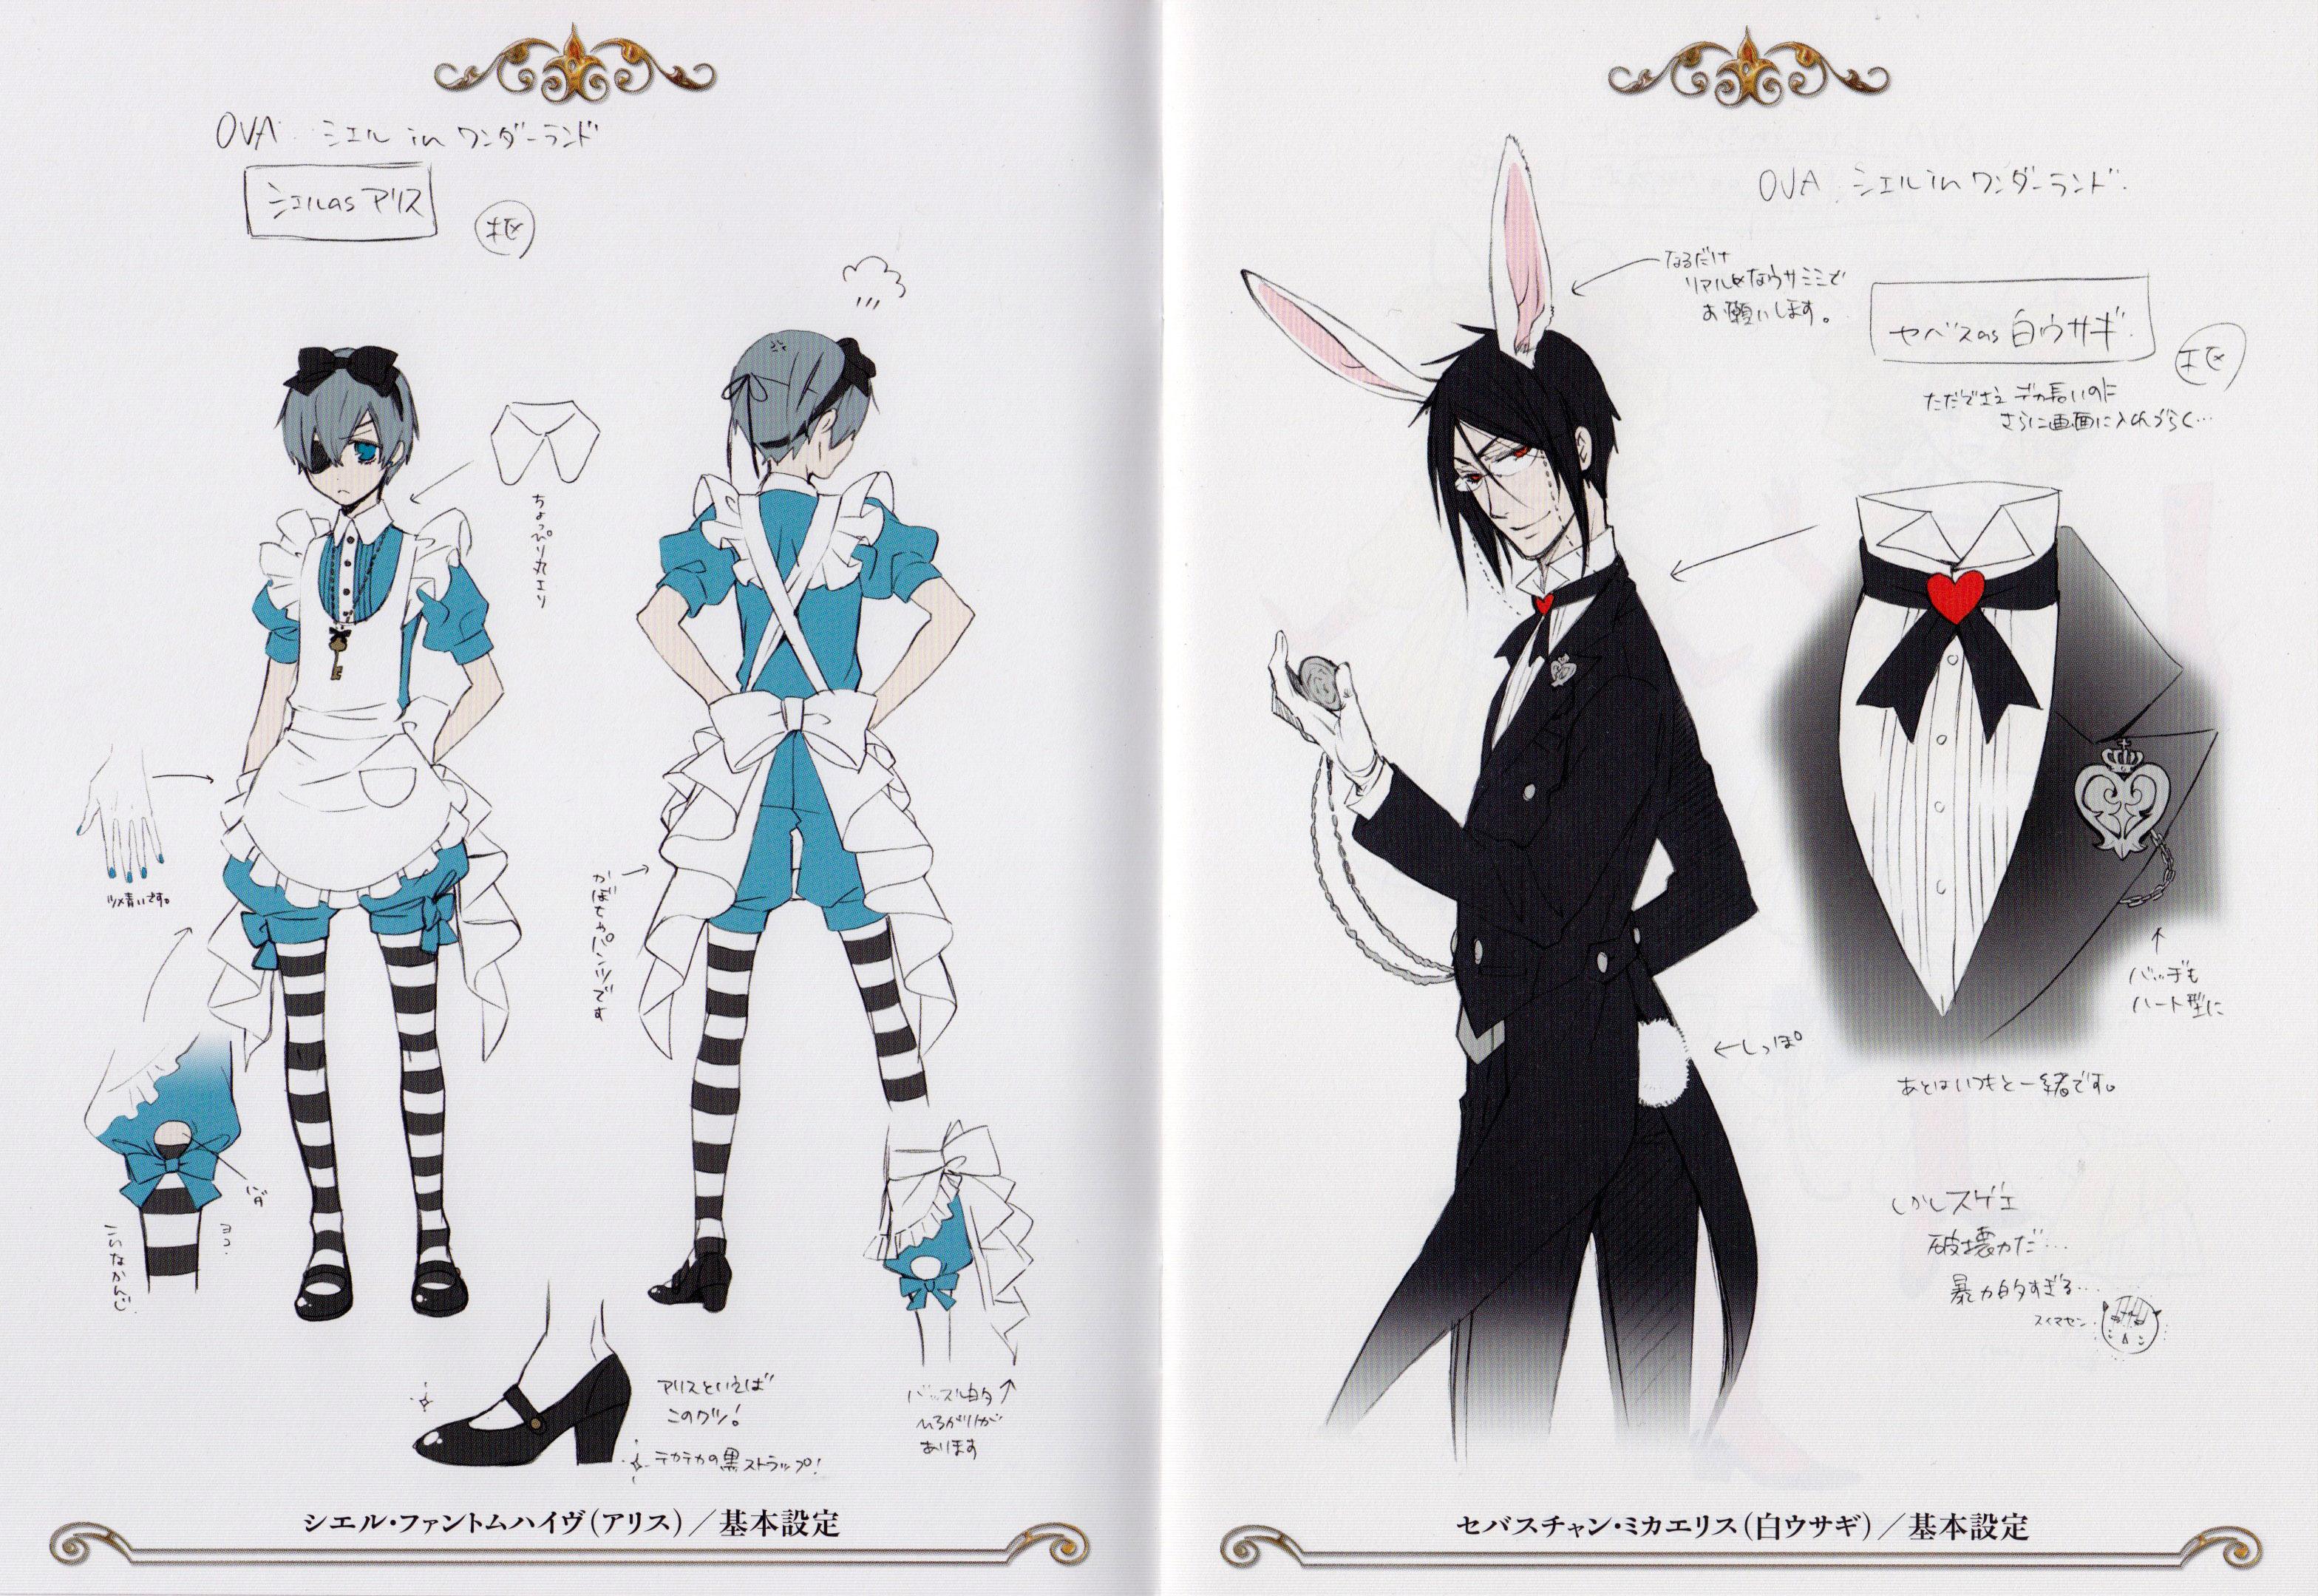 Bunny Tail - Zerochan Anime Image Board